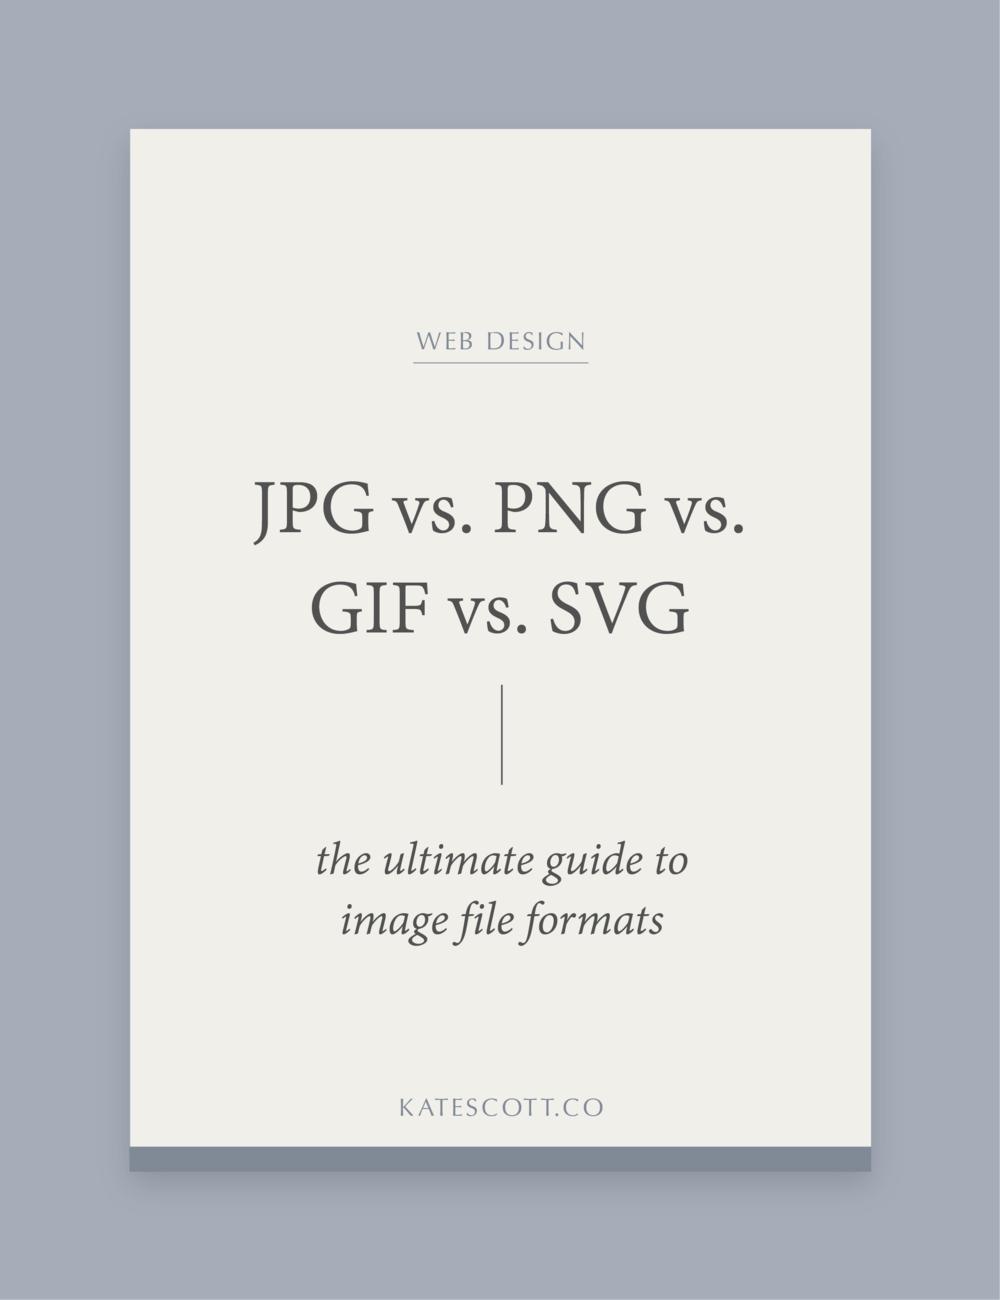 Jpg Vs Png Vs Gif Vs Svg The Ultimate Guide To Image File Formats Squarespace Designer Kate Scott Web Design Web Design Quotes Image File Formats